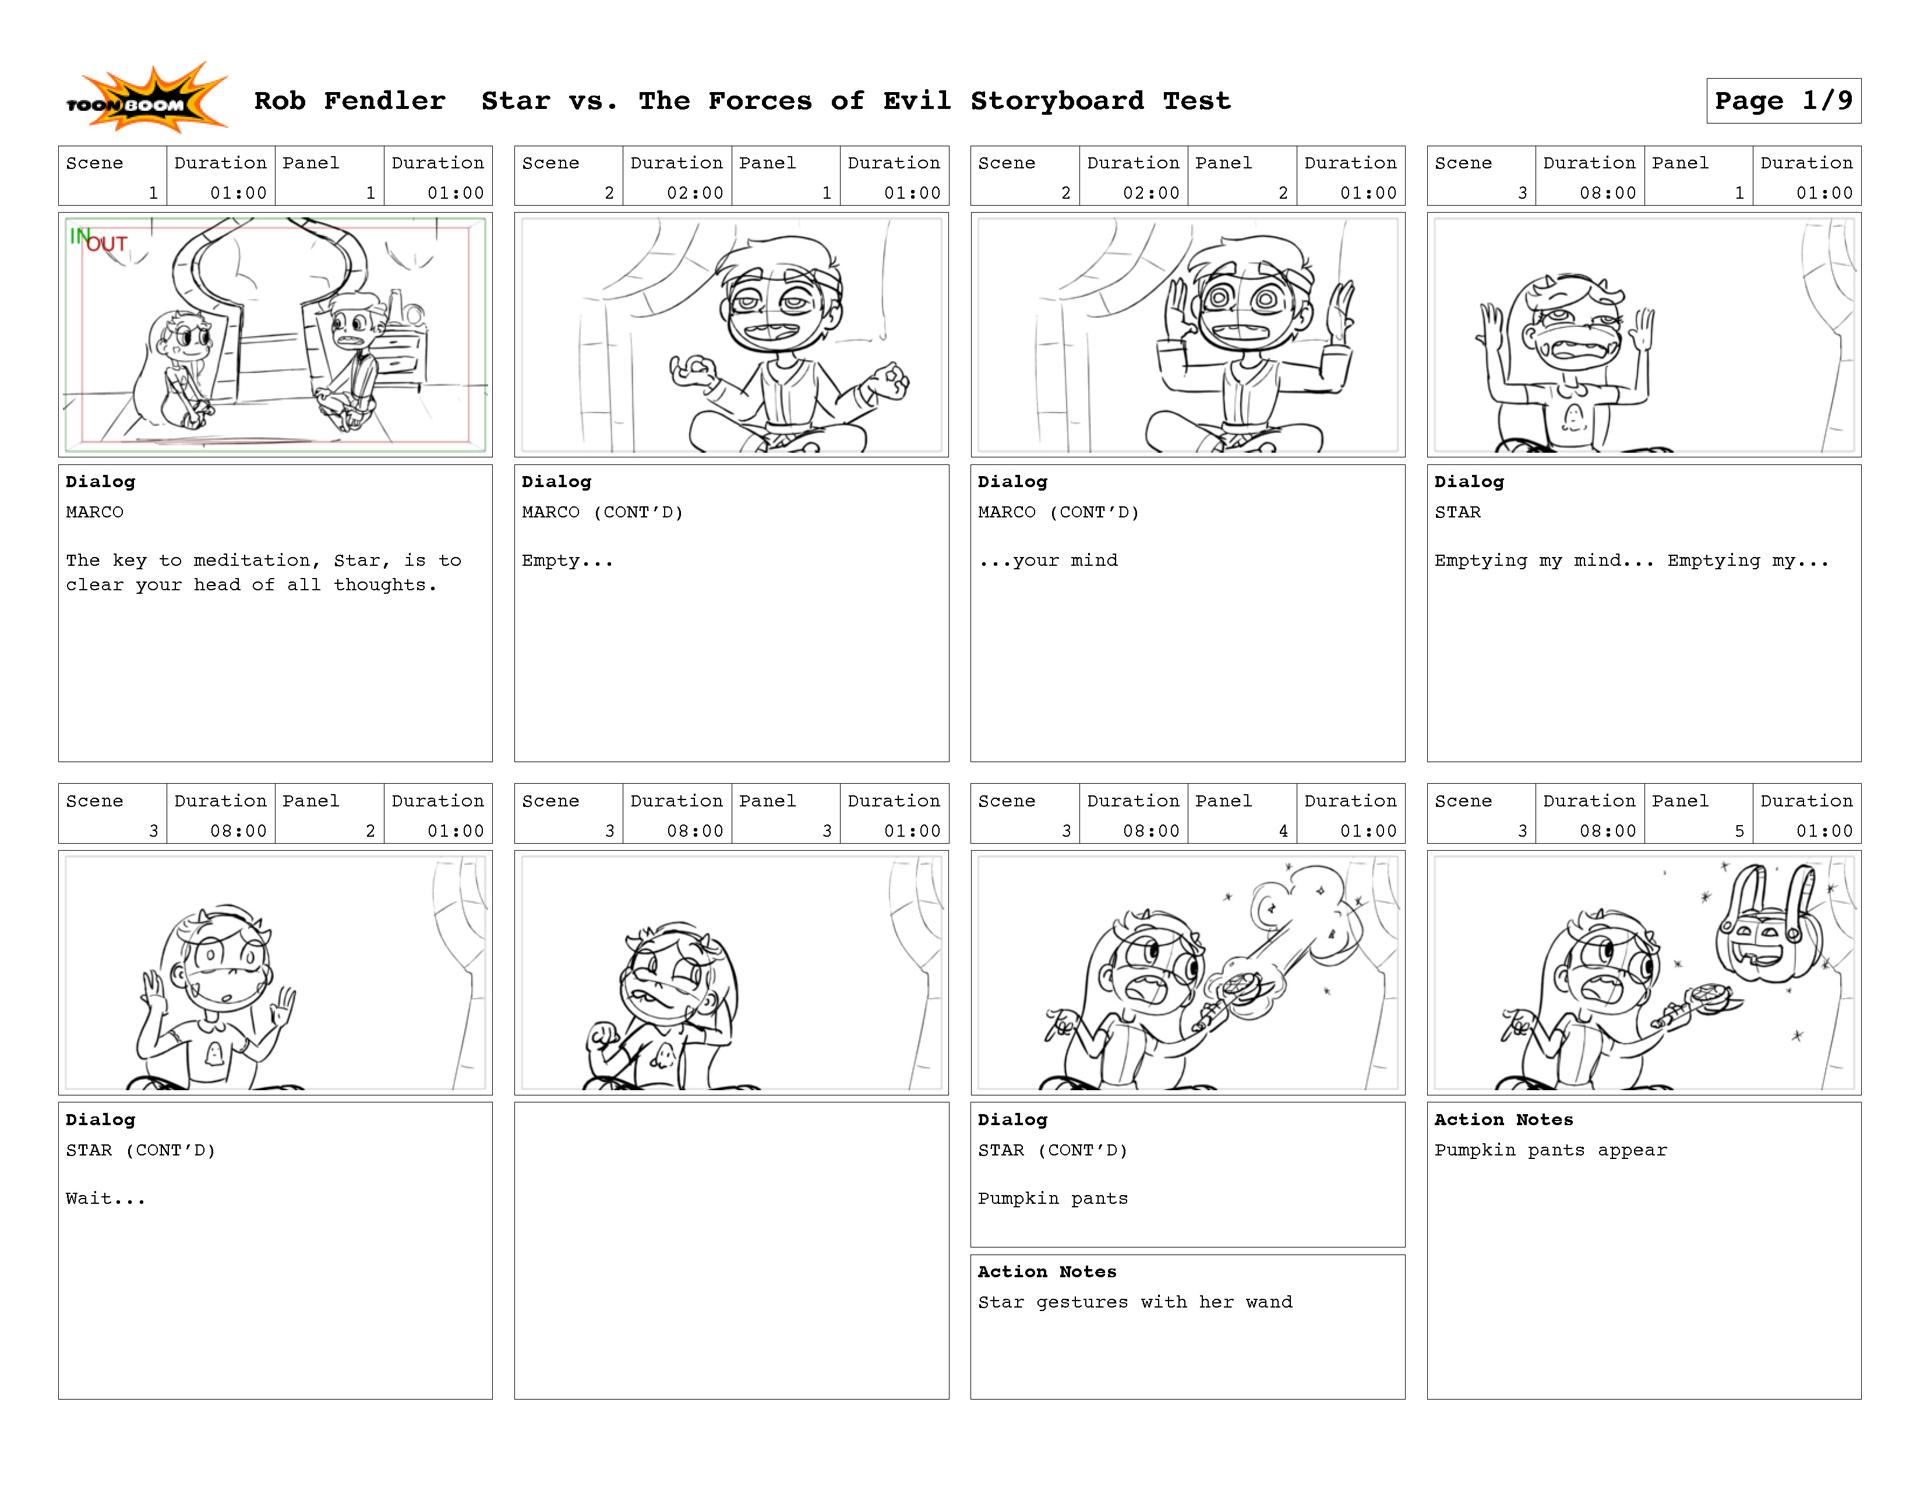 StarVs_Storyboardtest_Page_1_1920